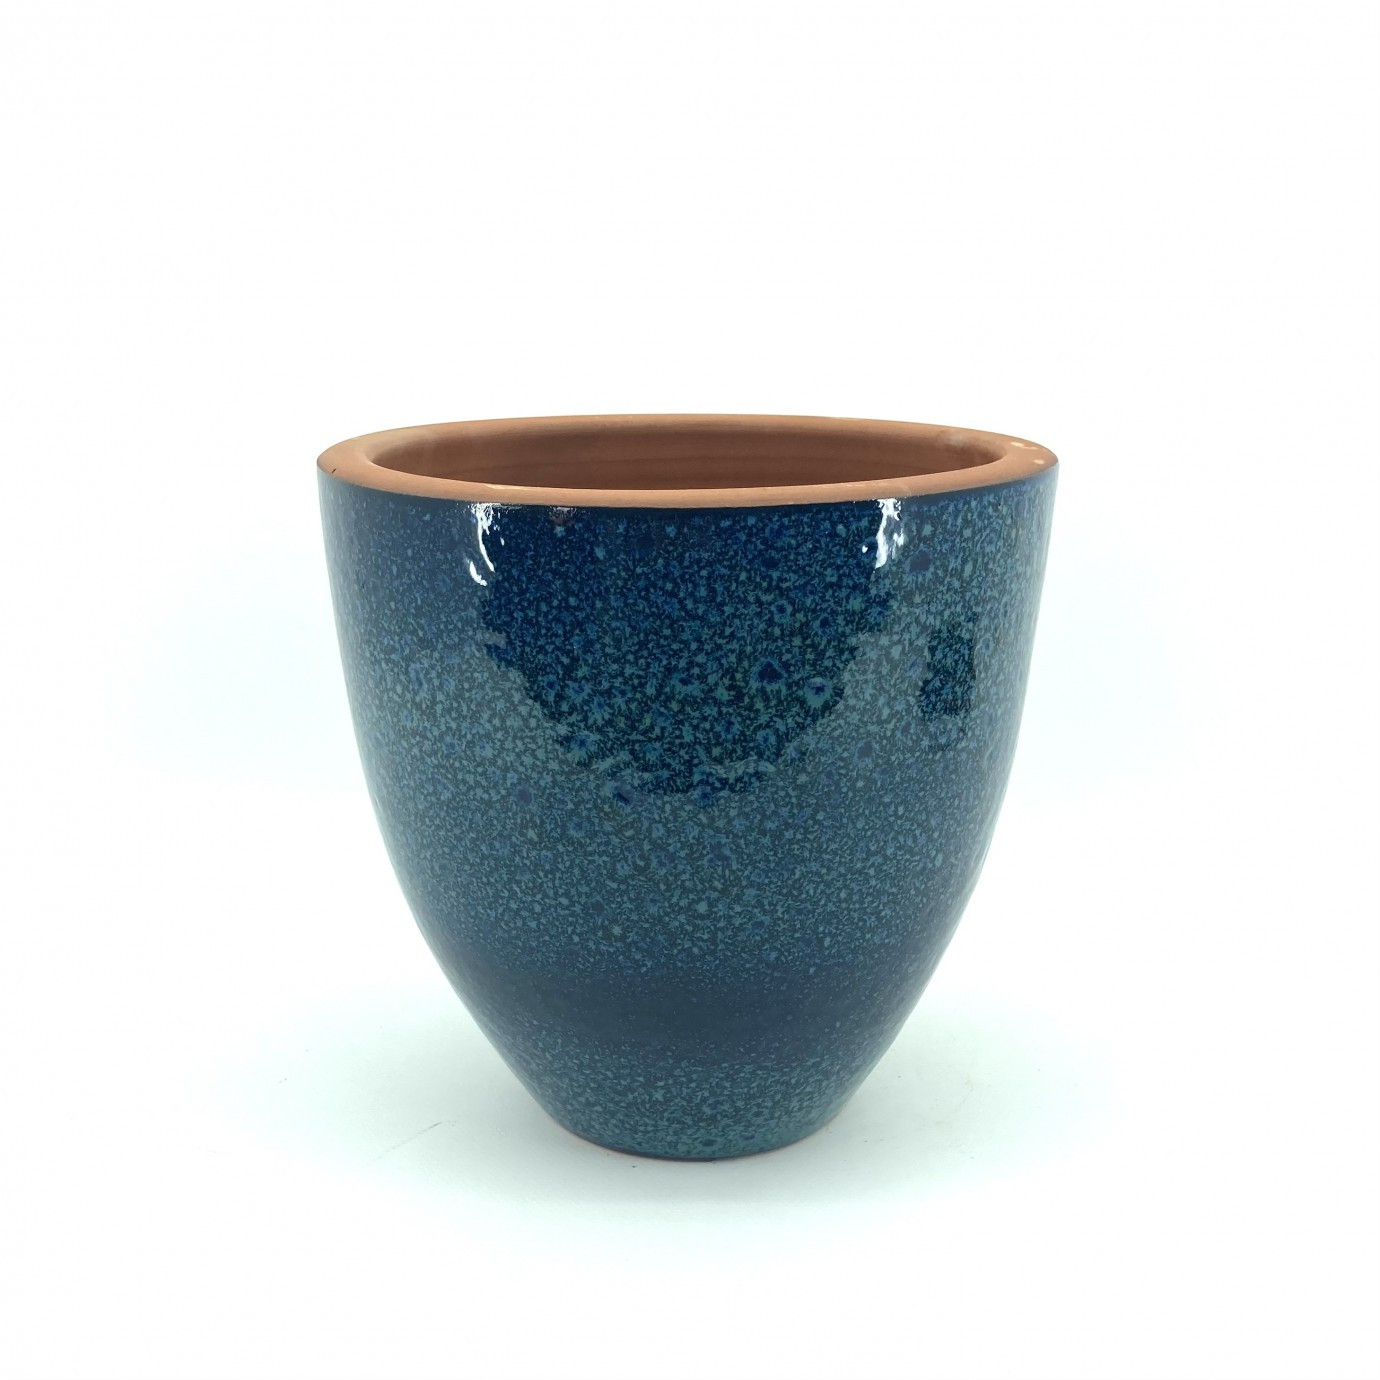 Mavi Çift Sırlı Toprak Saksı 18X18-Solino